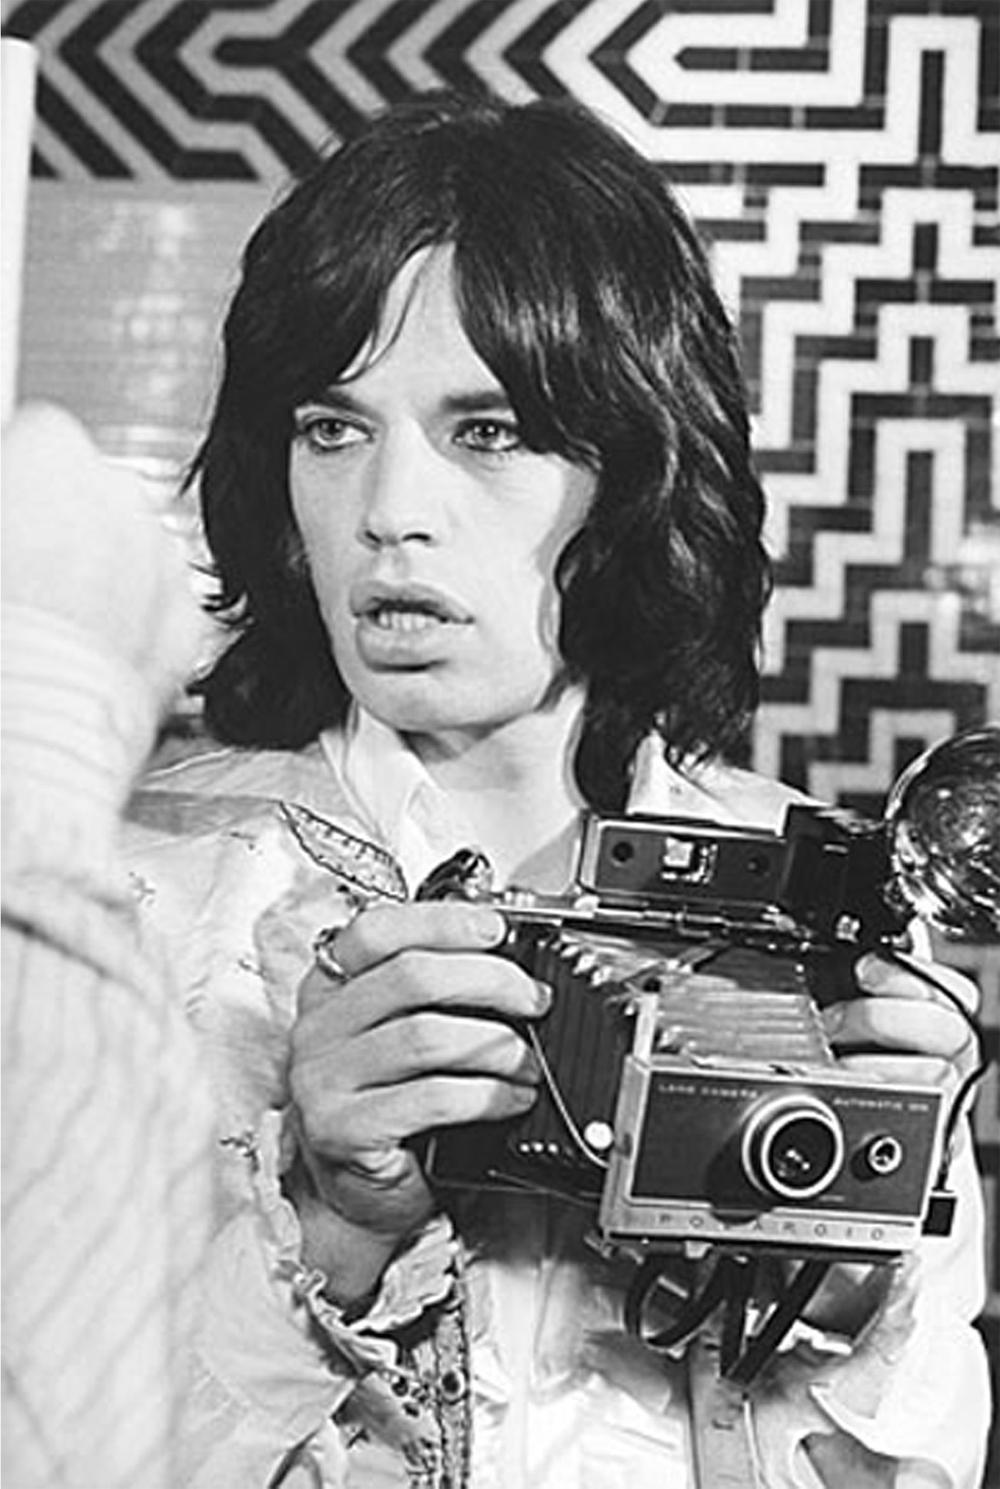 Mick Jagger On Set of Performance